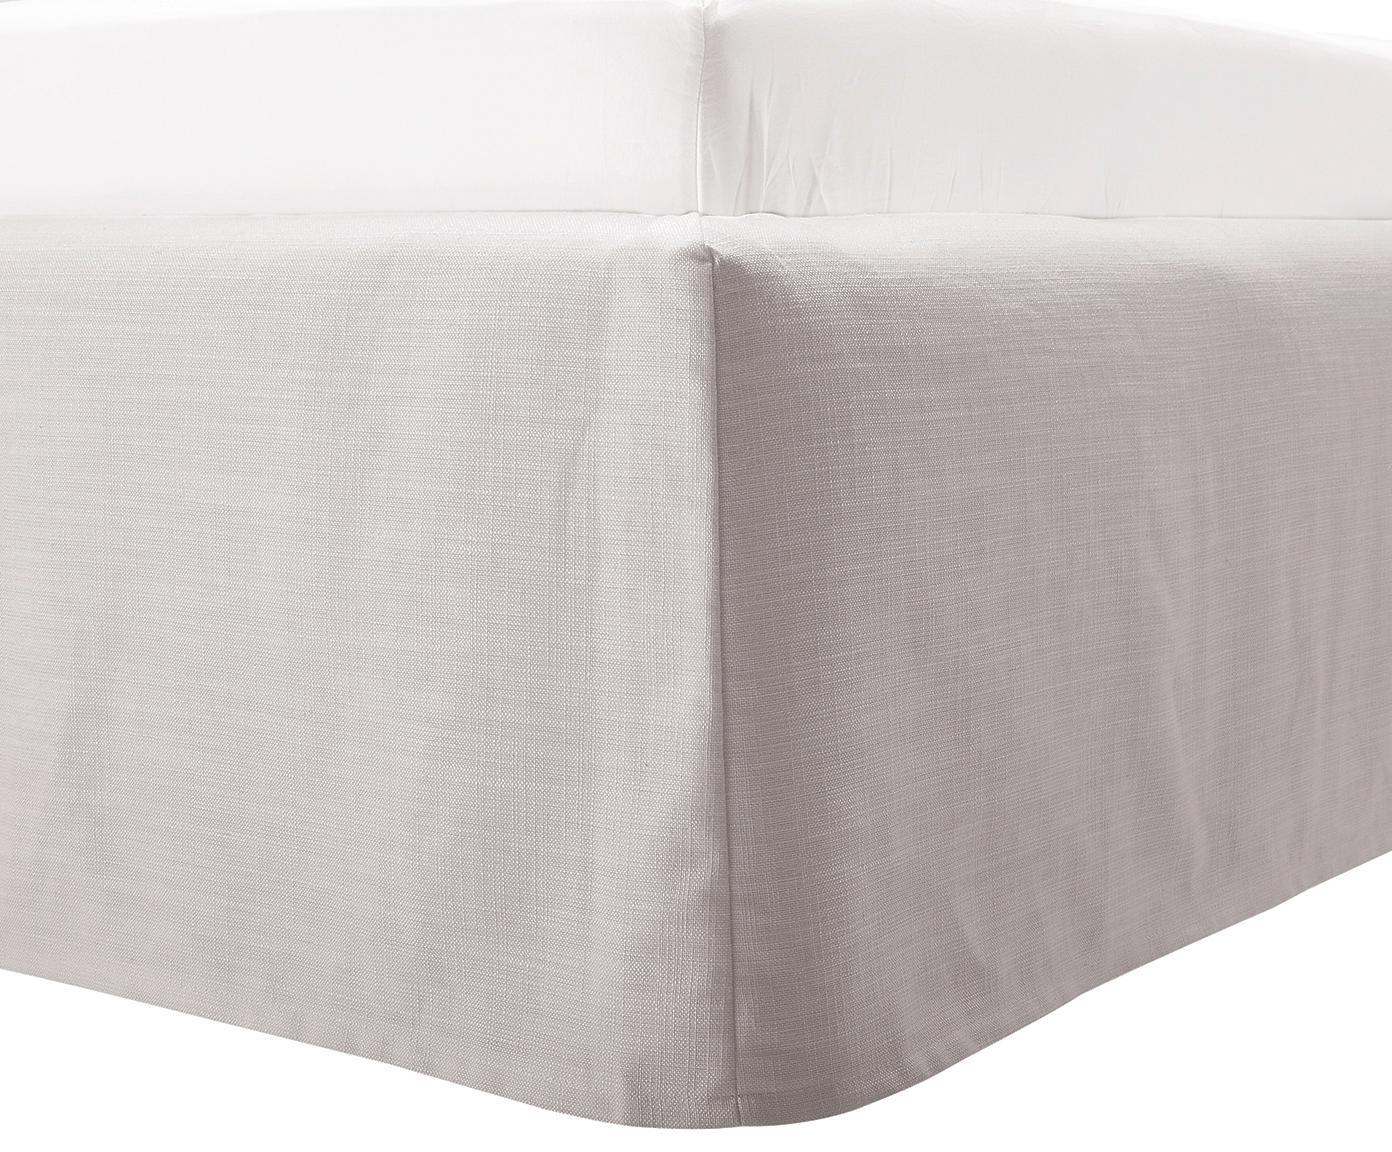 Gestoffeerd bed Feather met opbergfunctie, Frame: massief grenenhout, Bekleding: polyester (structuurmater, Lichtgrijs, 160 x 200 cm